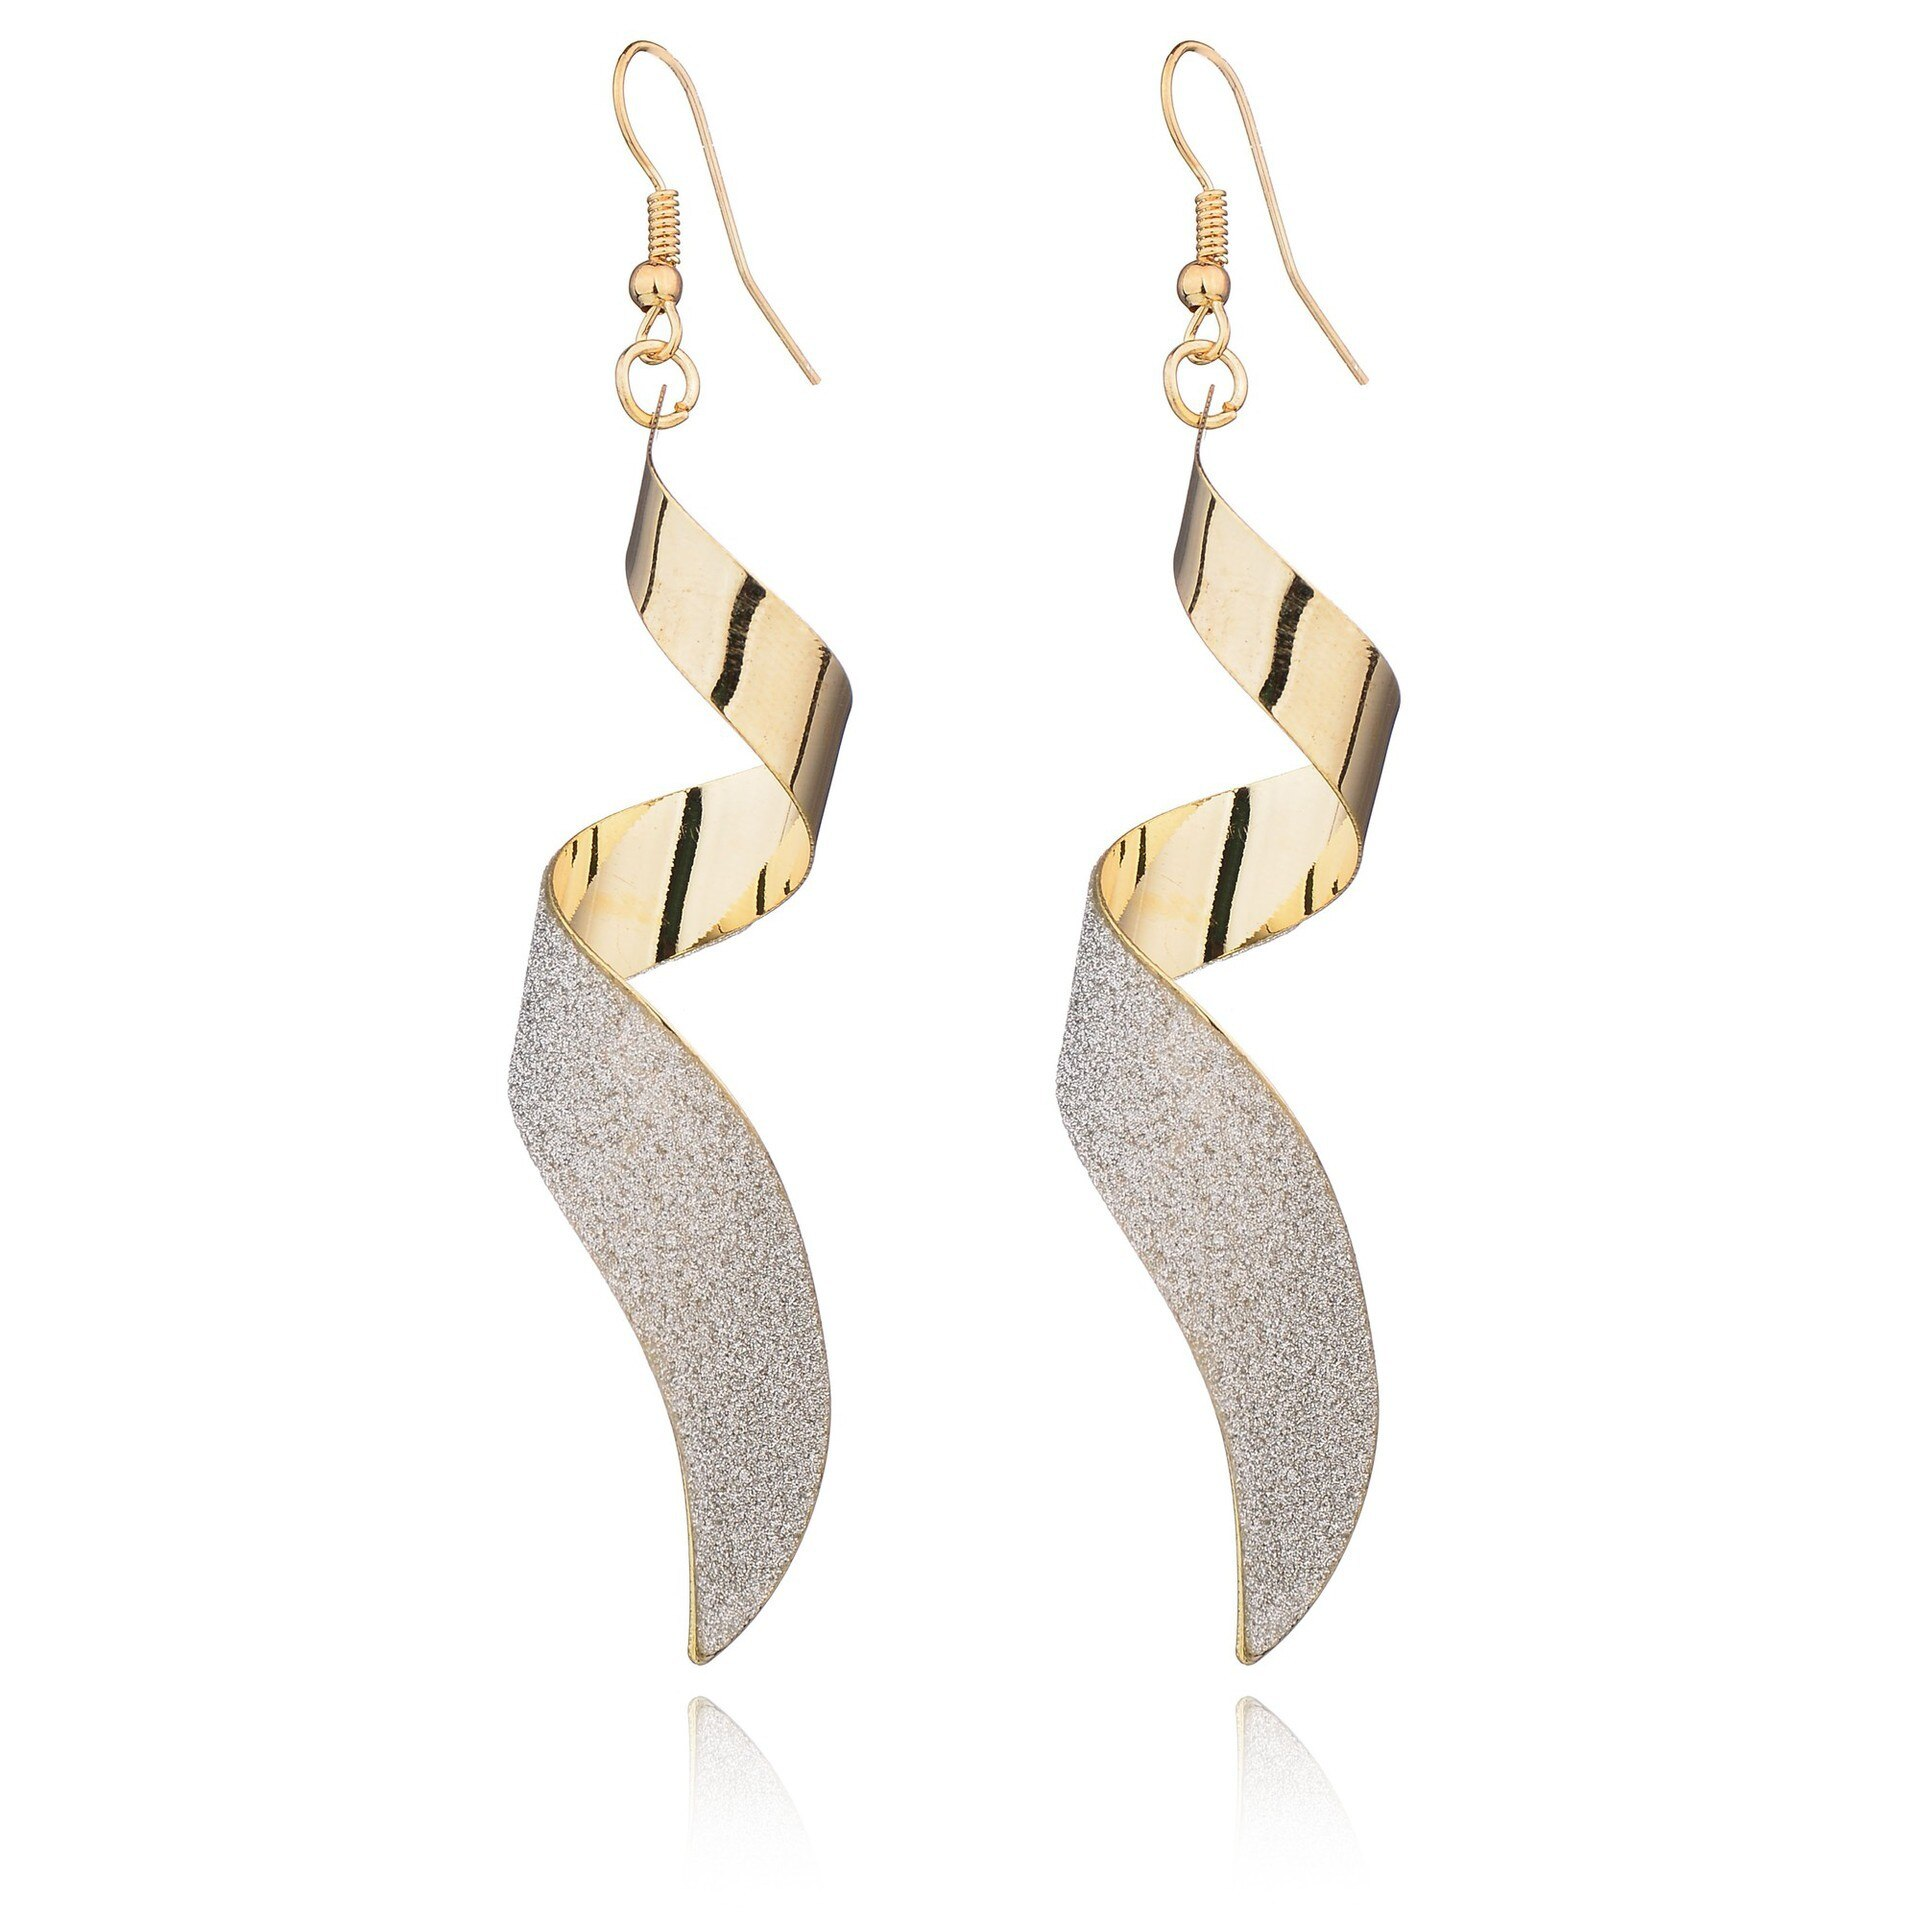 1Pair Punk Women Twist Spiral Dangle Charm Earrings Jewelry Valentine's Day Gift  Gold Black stainless steel Long Earrings